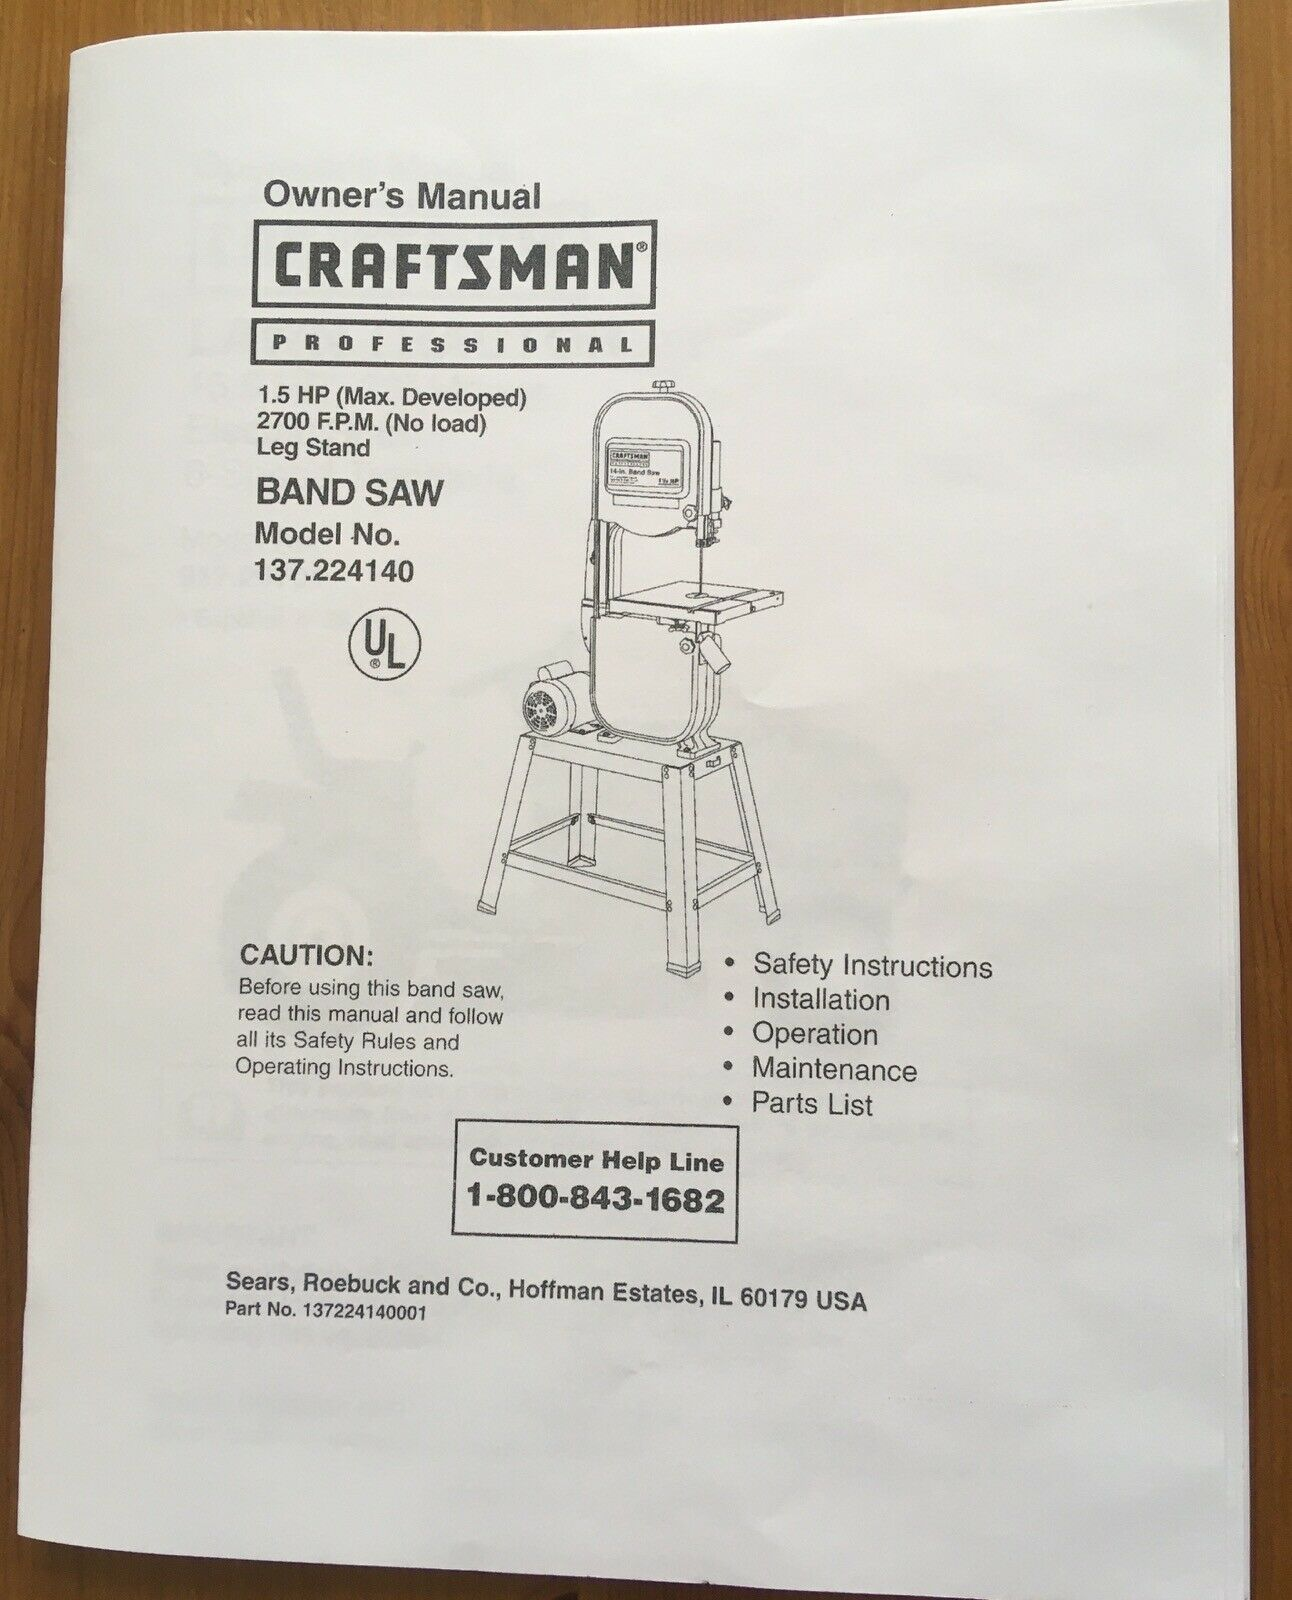 Craftsman Band Saw Model 137.224140 Operating Instructions & Parts Manual